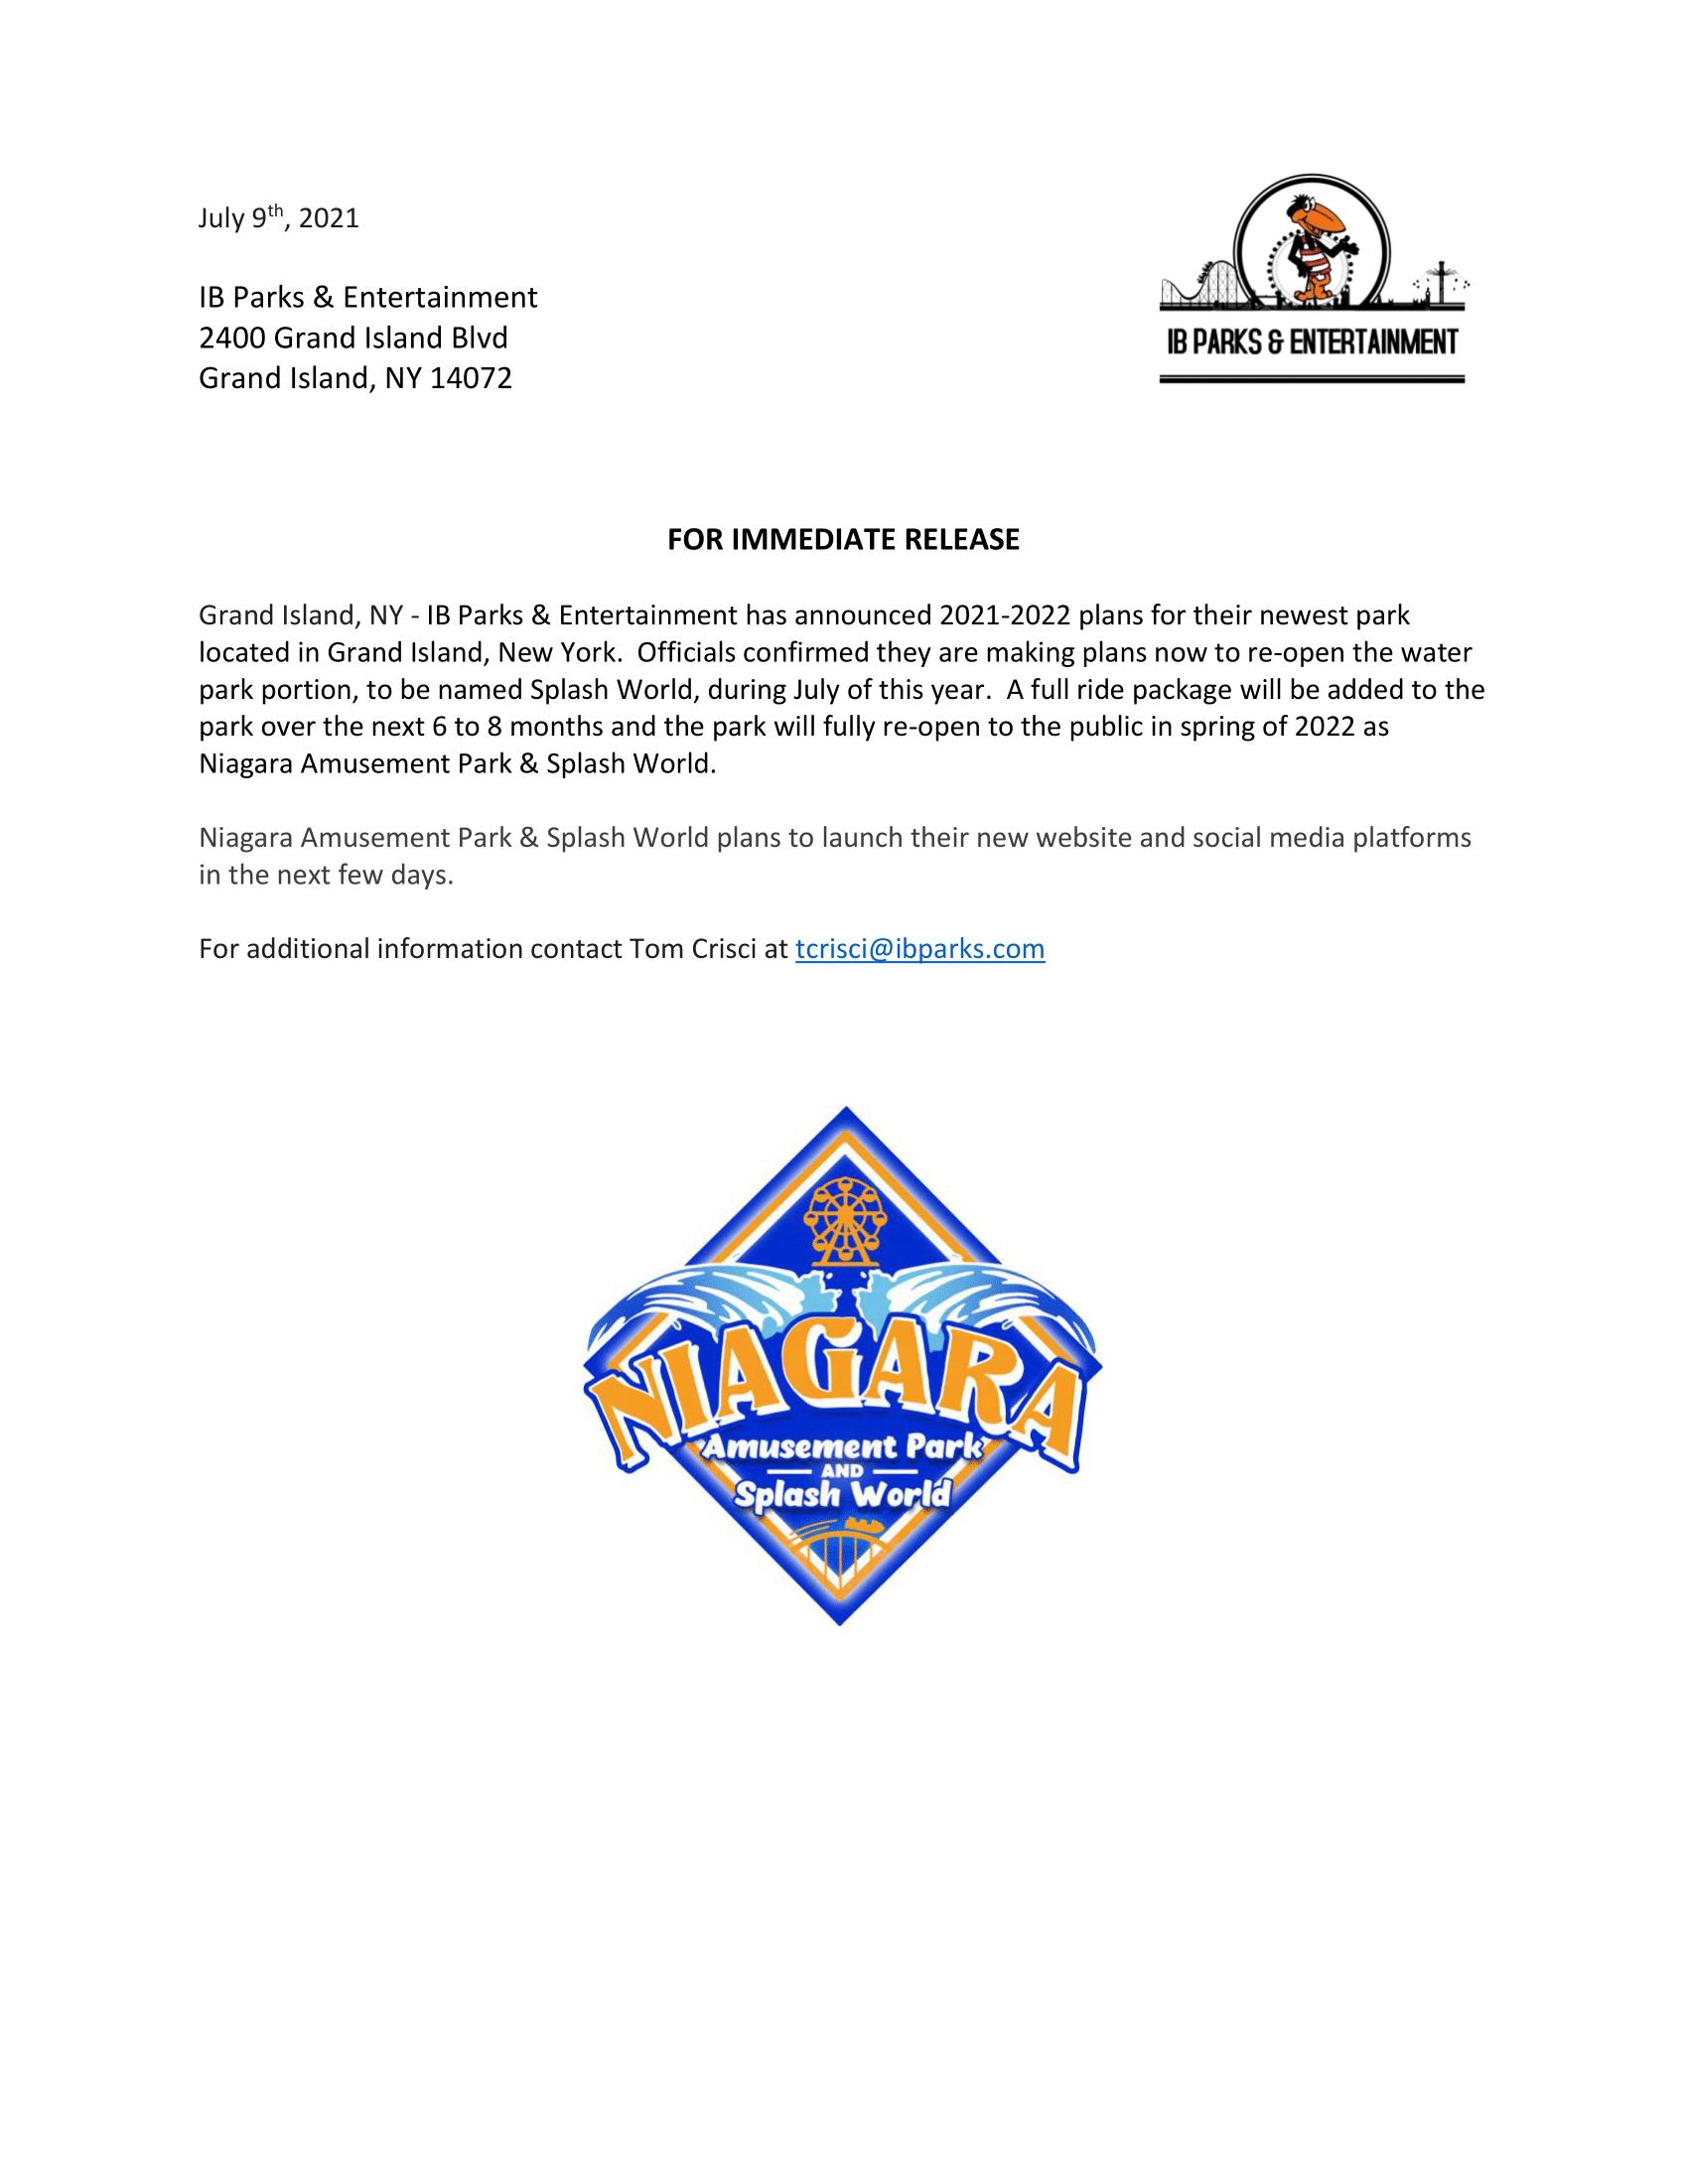 July 9th 2021 Press Release V2-1